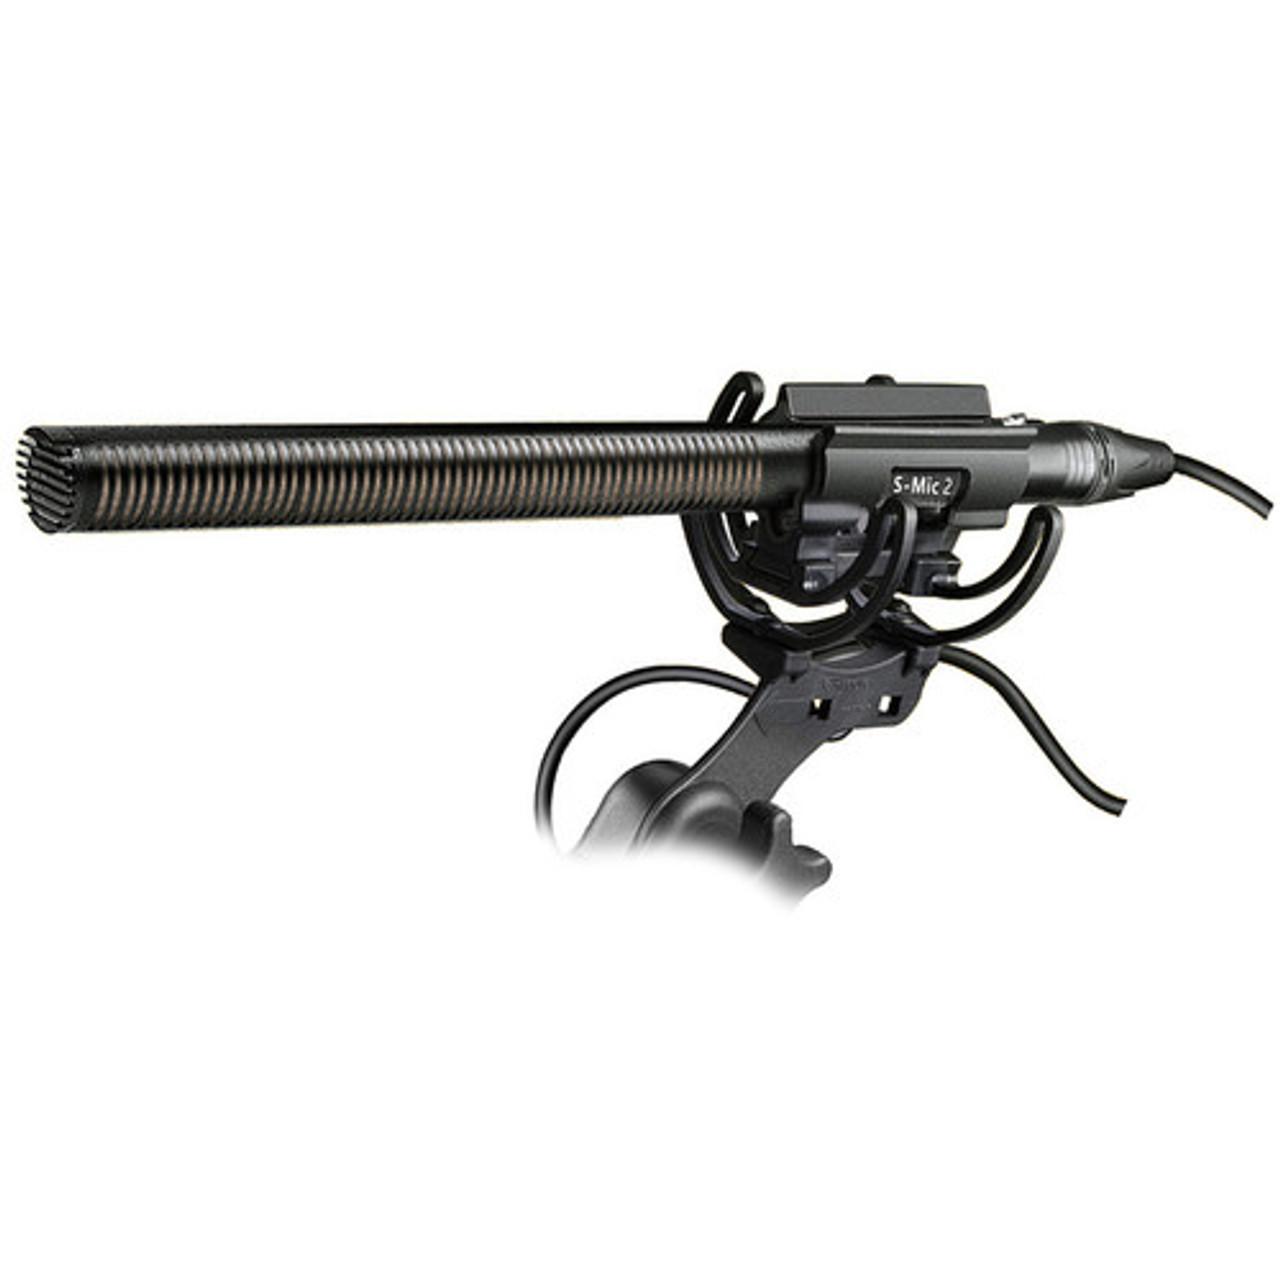 Deity Microphones S-Mic 2 Shotgun Microphone and Location Kit | Auckland |  NZ